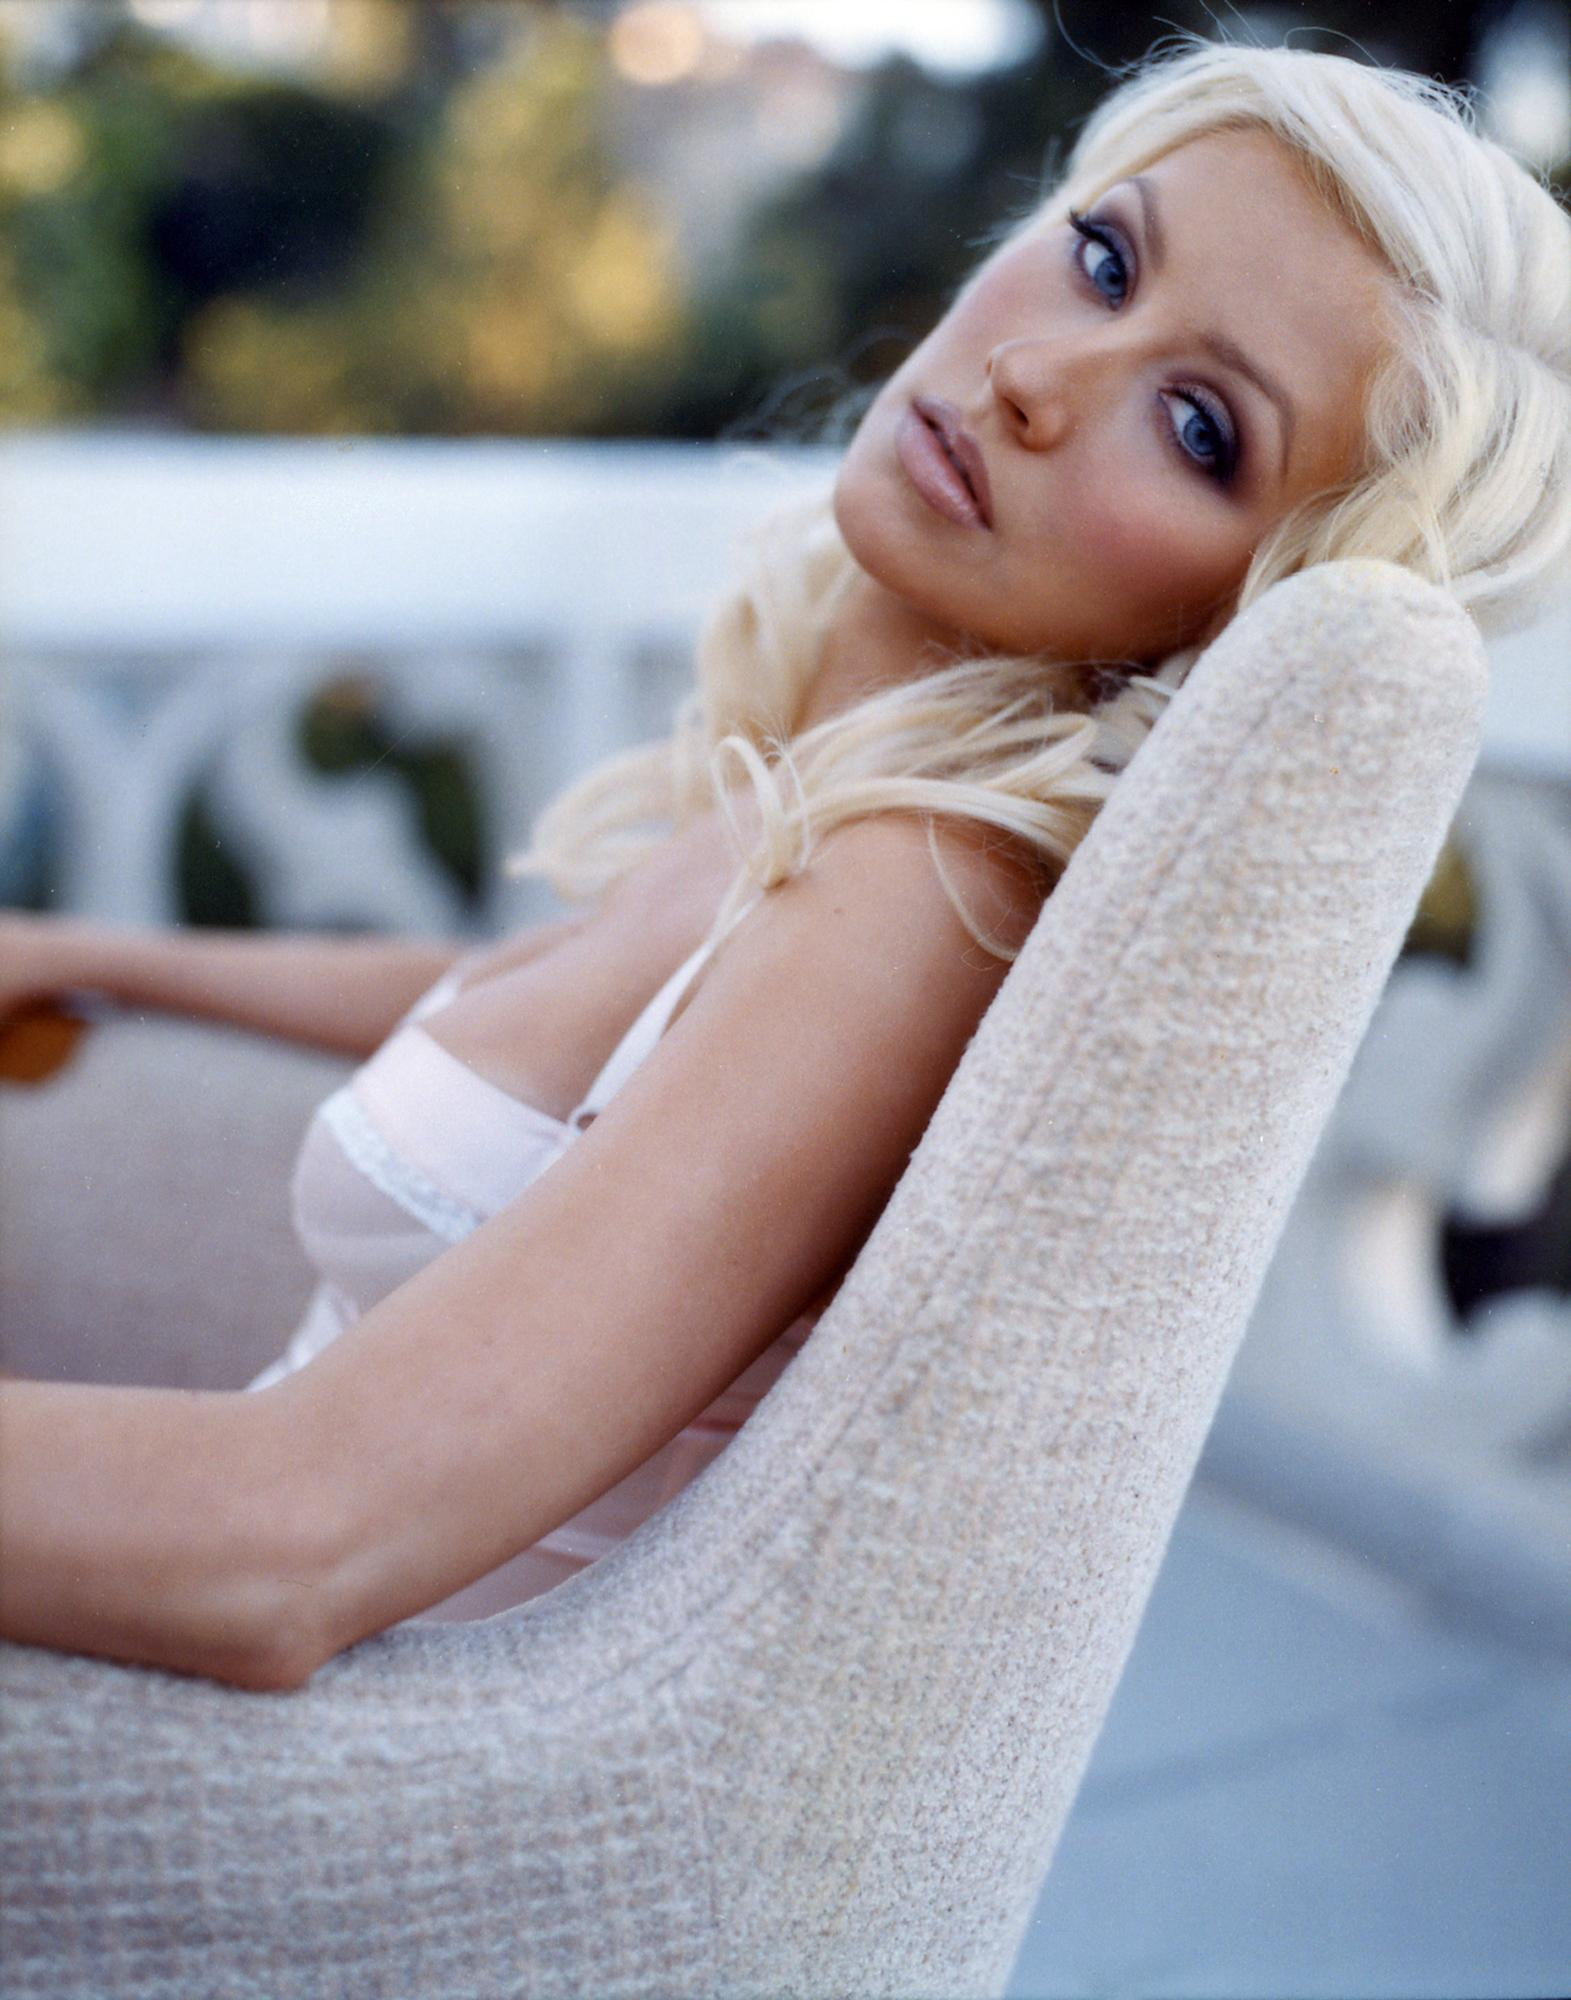 90212_Christina_Aguilera-000006_122_358lo.jpg